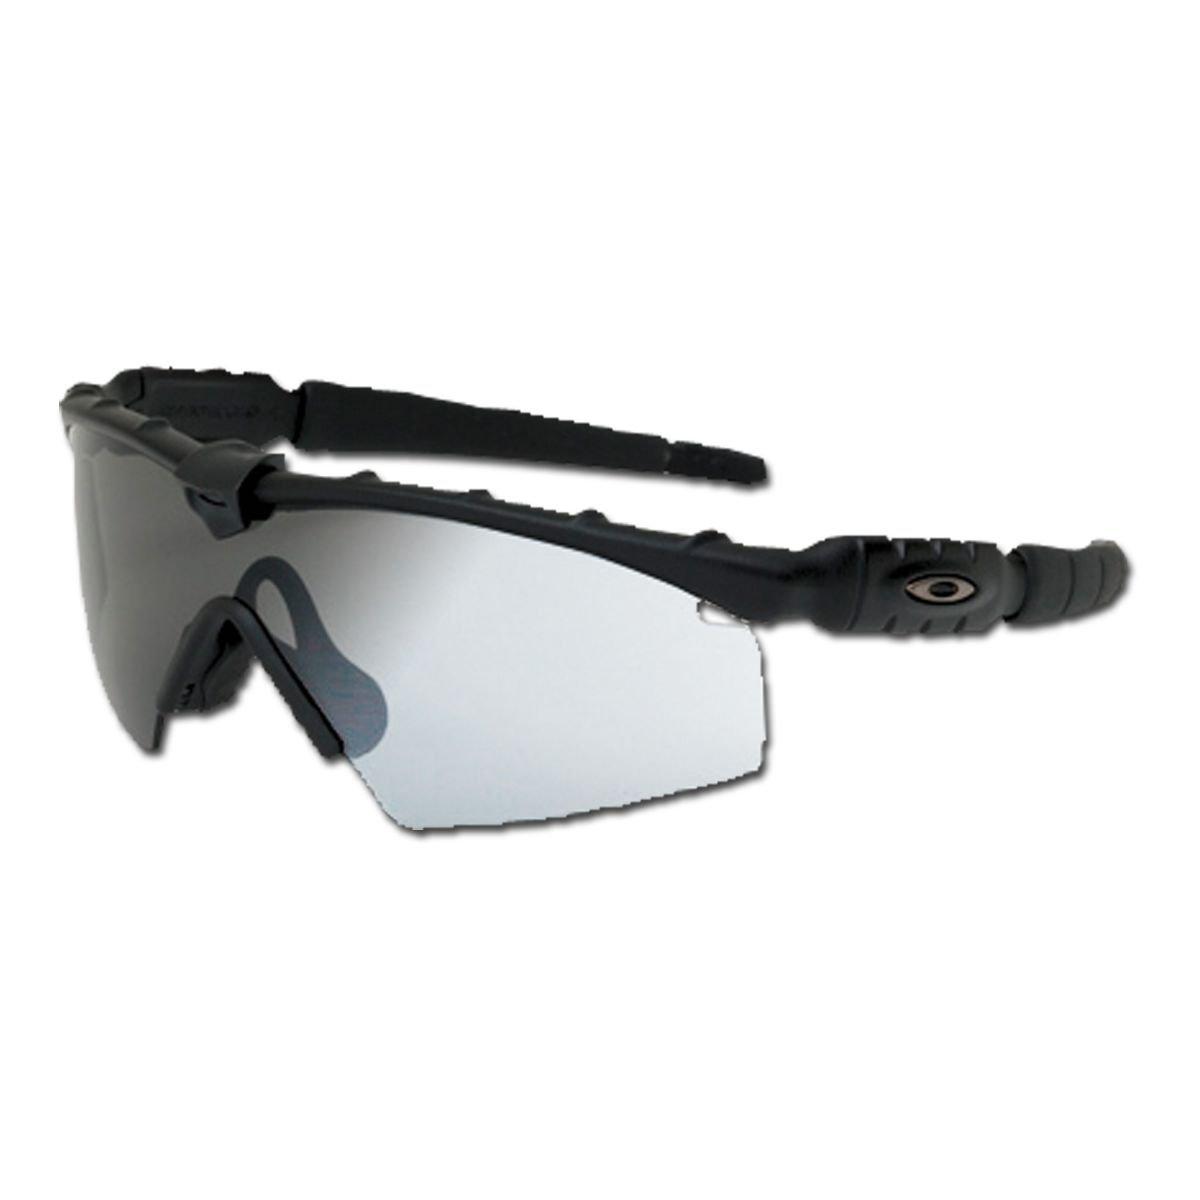 Sonnenbrille Oakley SI Ballistic M-Frame Photochrom: Amazon.de ...